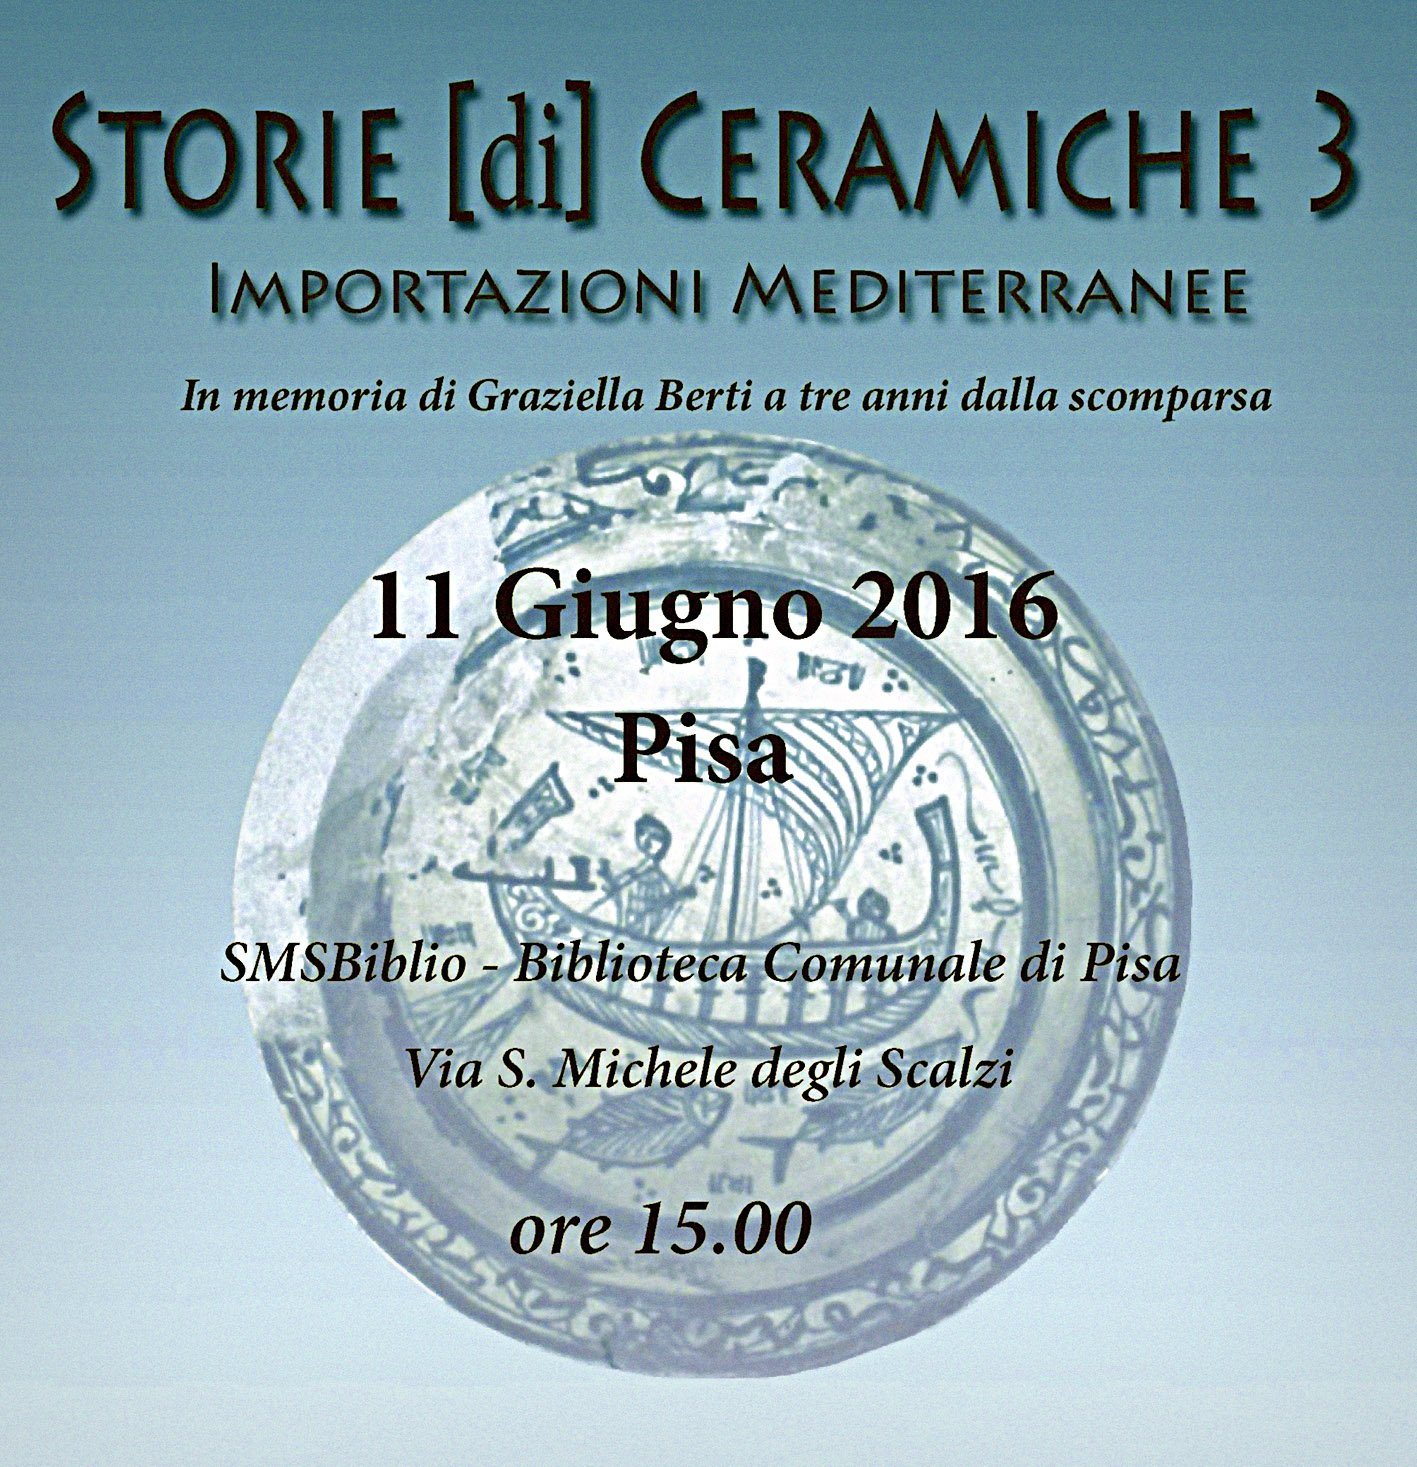 Storie (di) Ceramiche 3, Pisa, 2016.